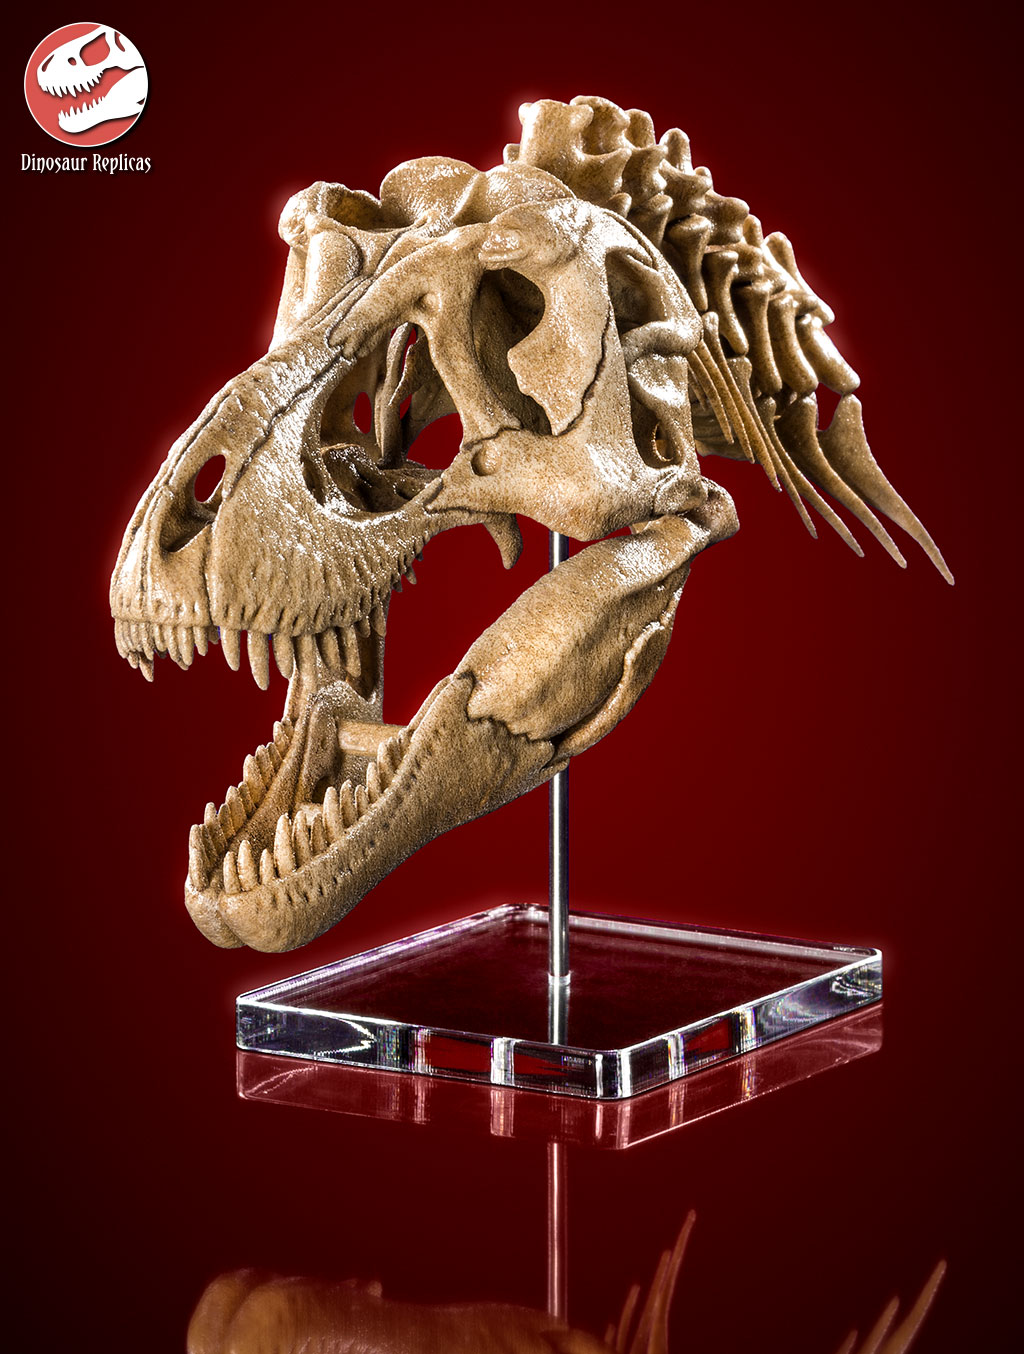 [Image: neckskull_rex_deviant_04a_by_strick67-dcnr9bb.jpg]